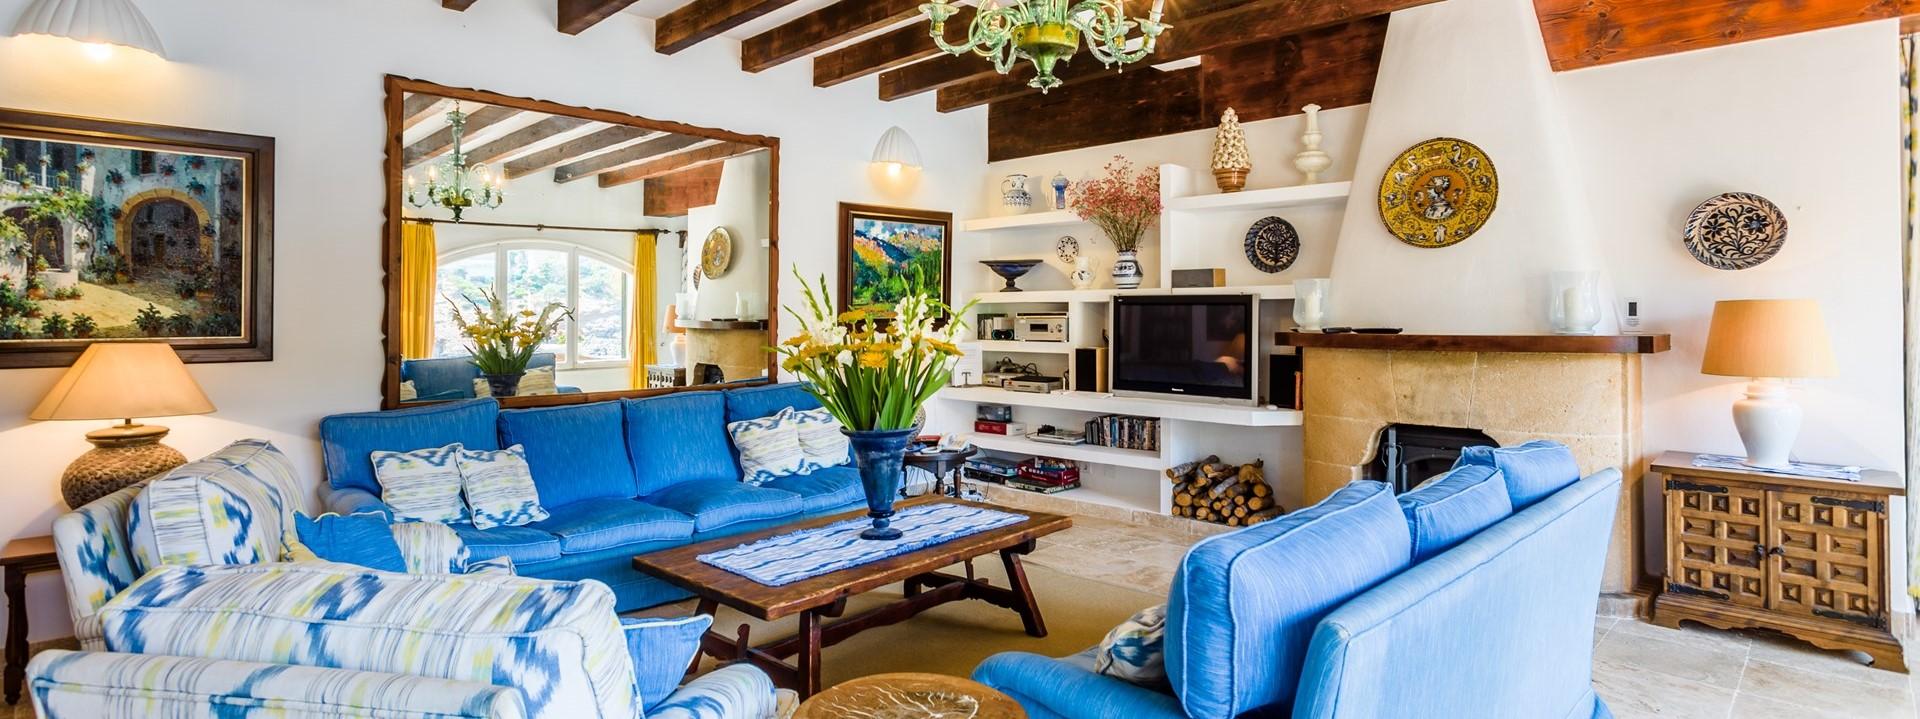 villa-mar-azul-mallorca-lounge